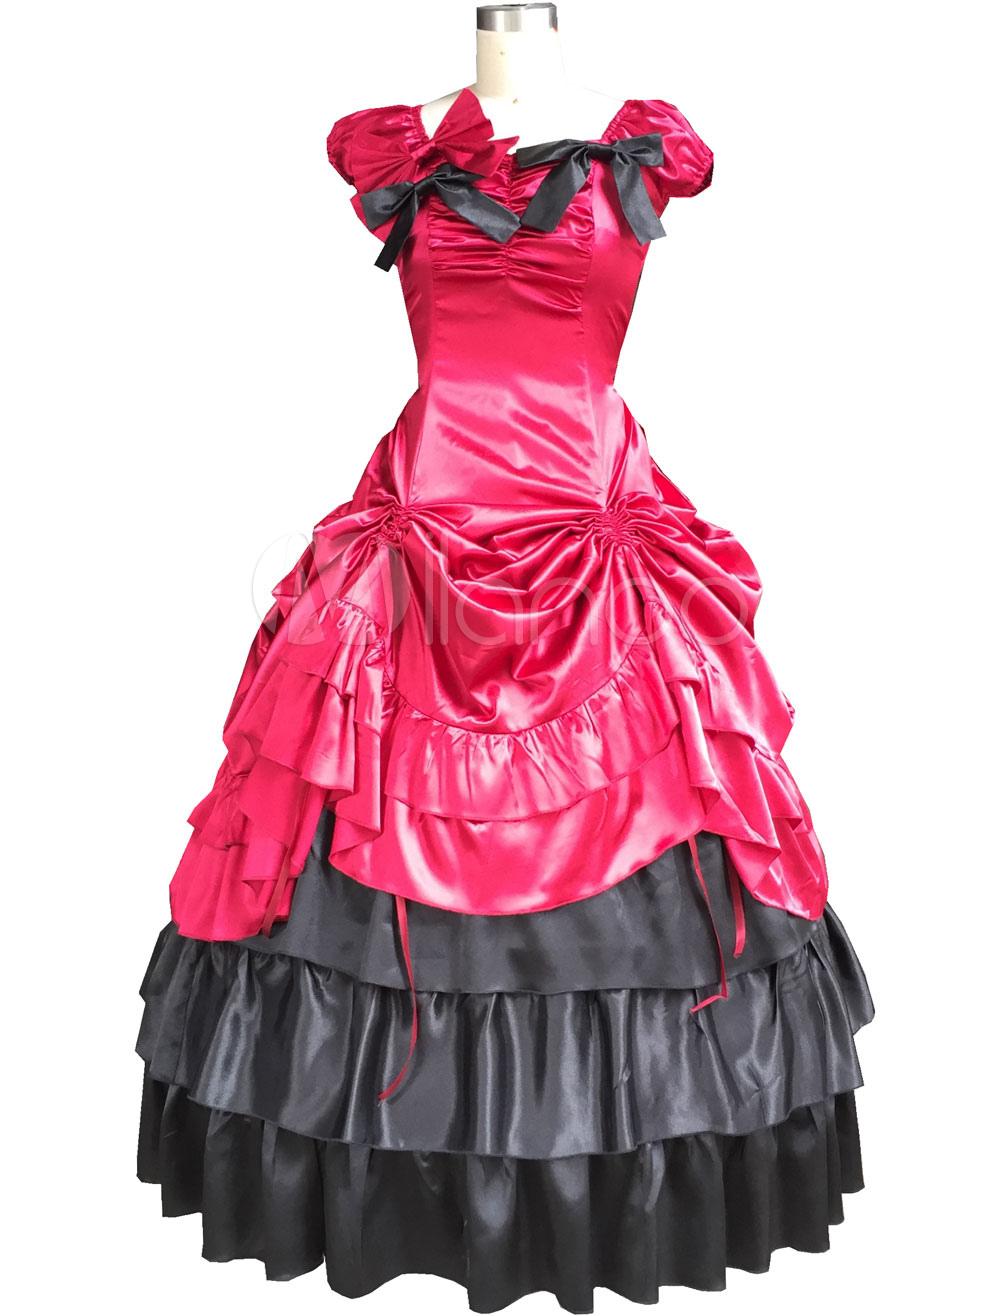 Elegant Red Satin Lolita One-piece Dress Sleeveless Ruffles Waist Belt Lace Bow